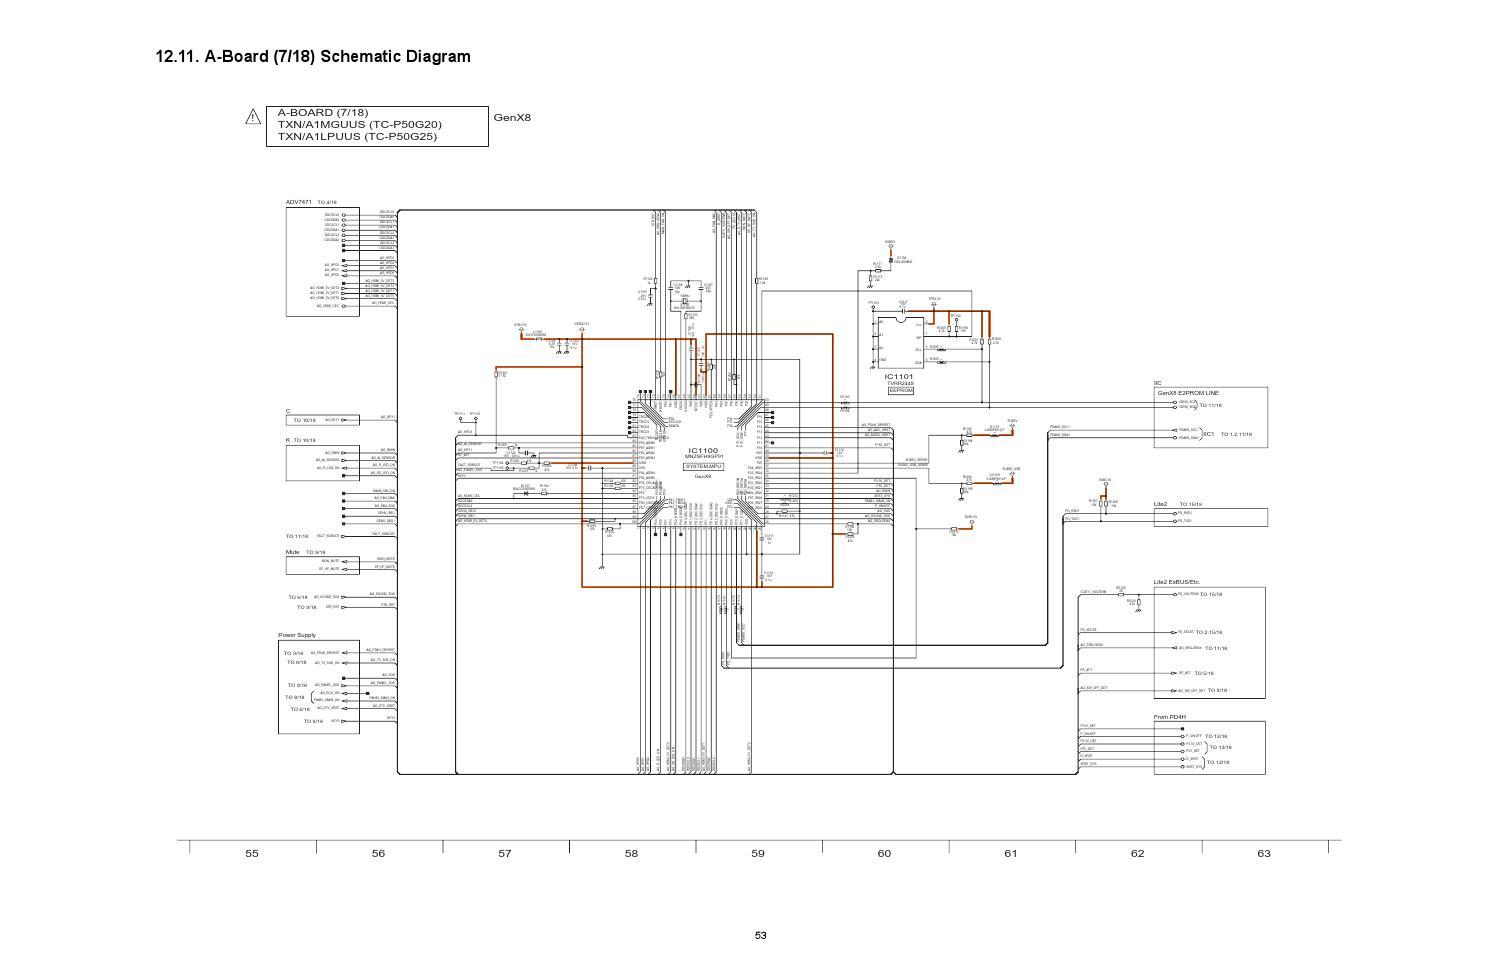 Manual de servico panasonic modelos tc p50g20 e tc p50g25